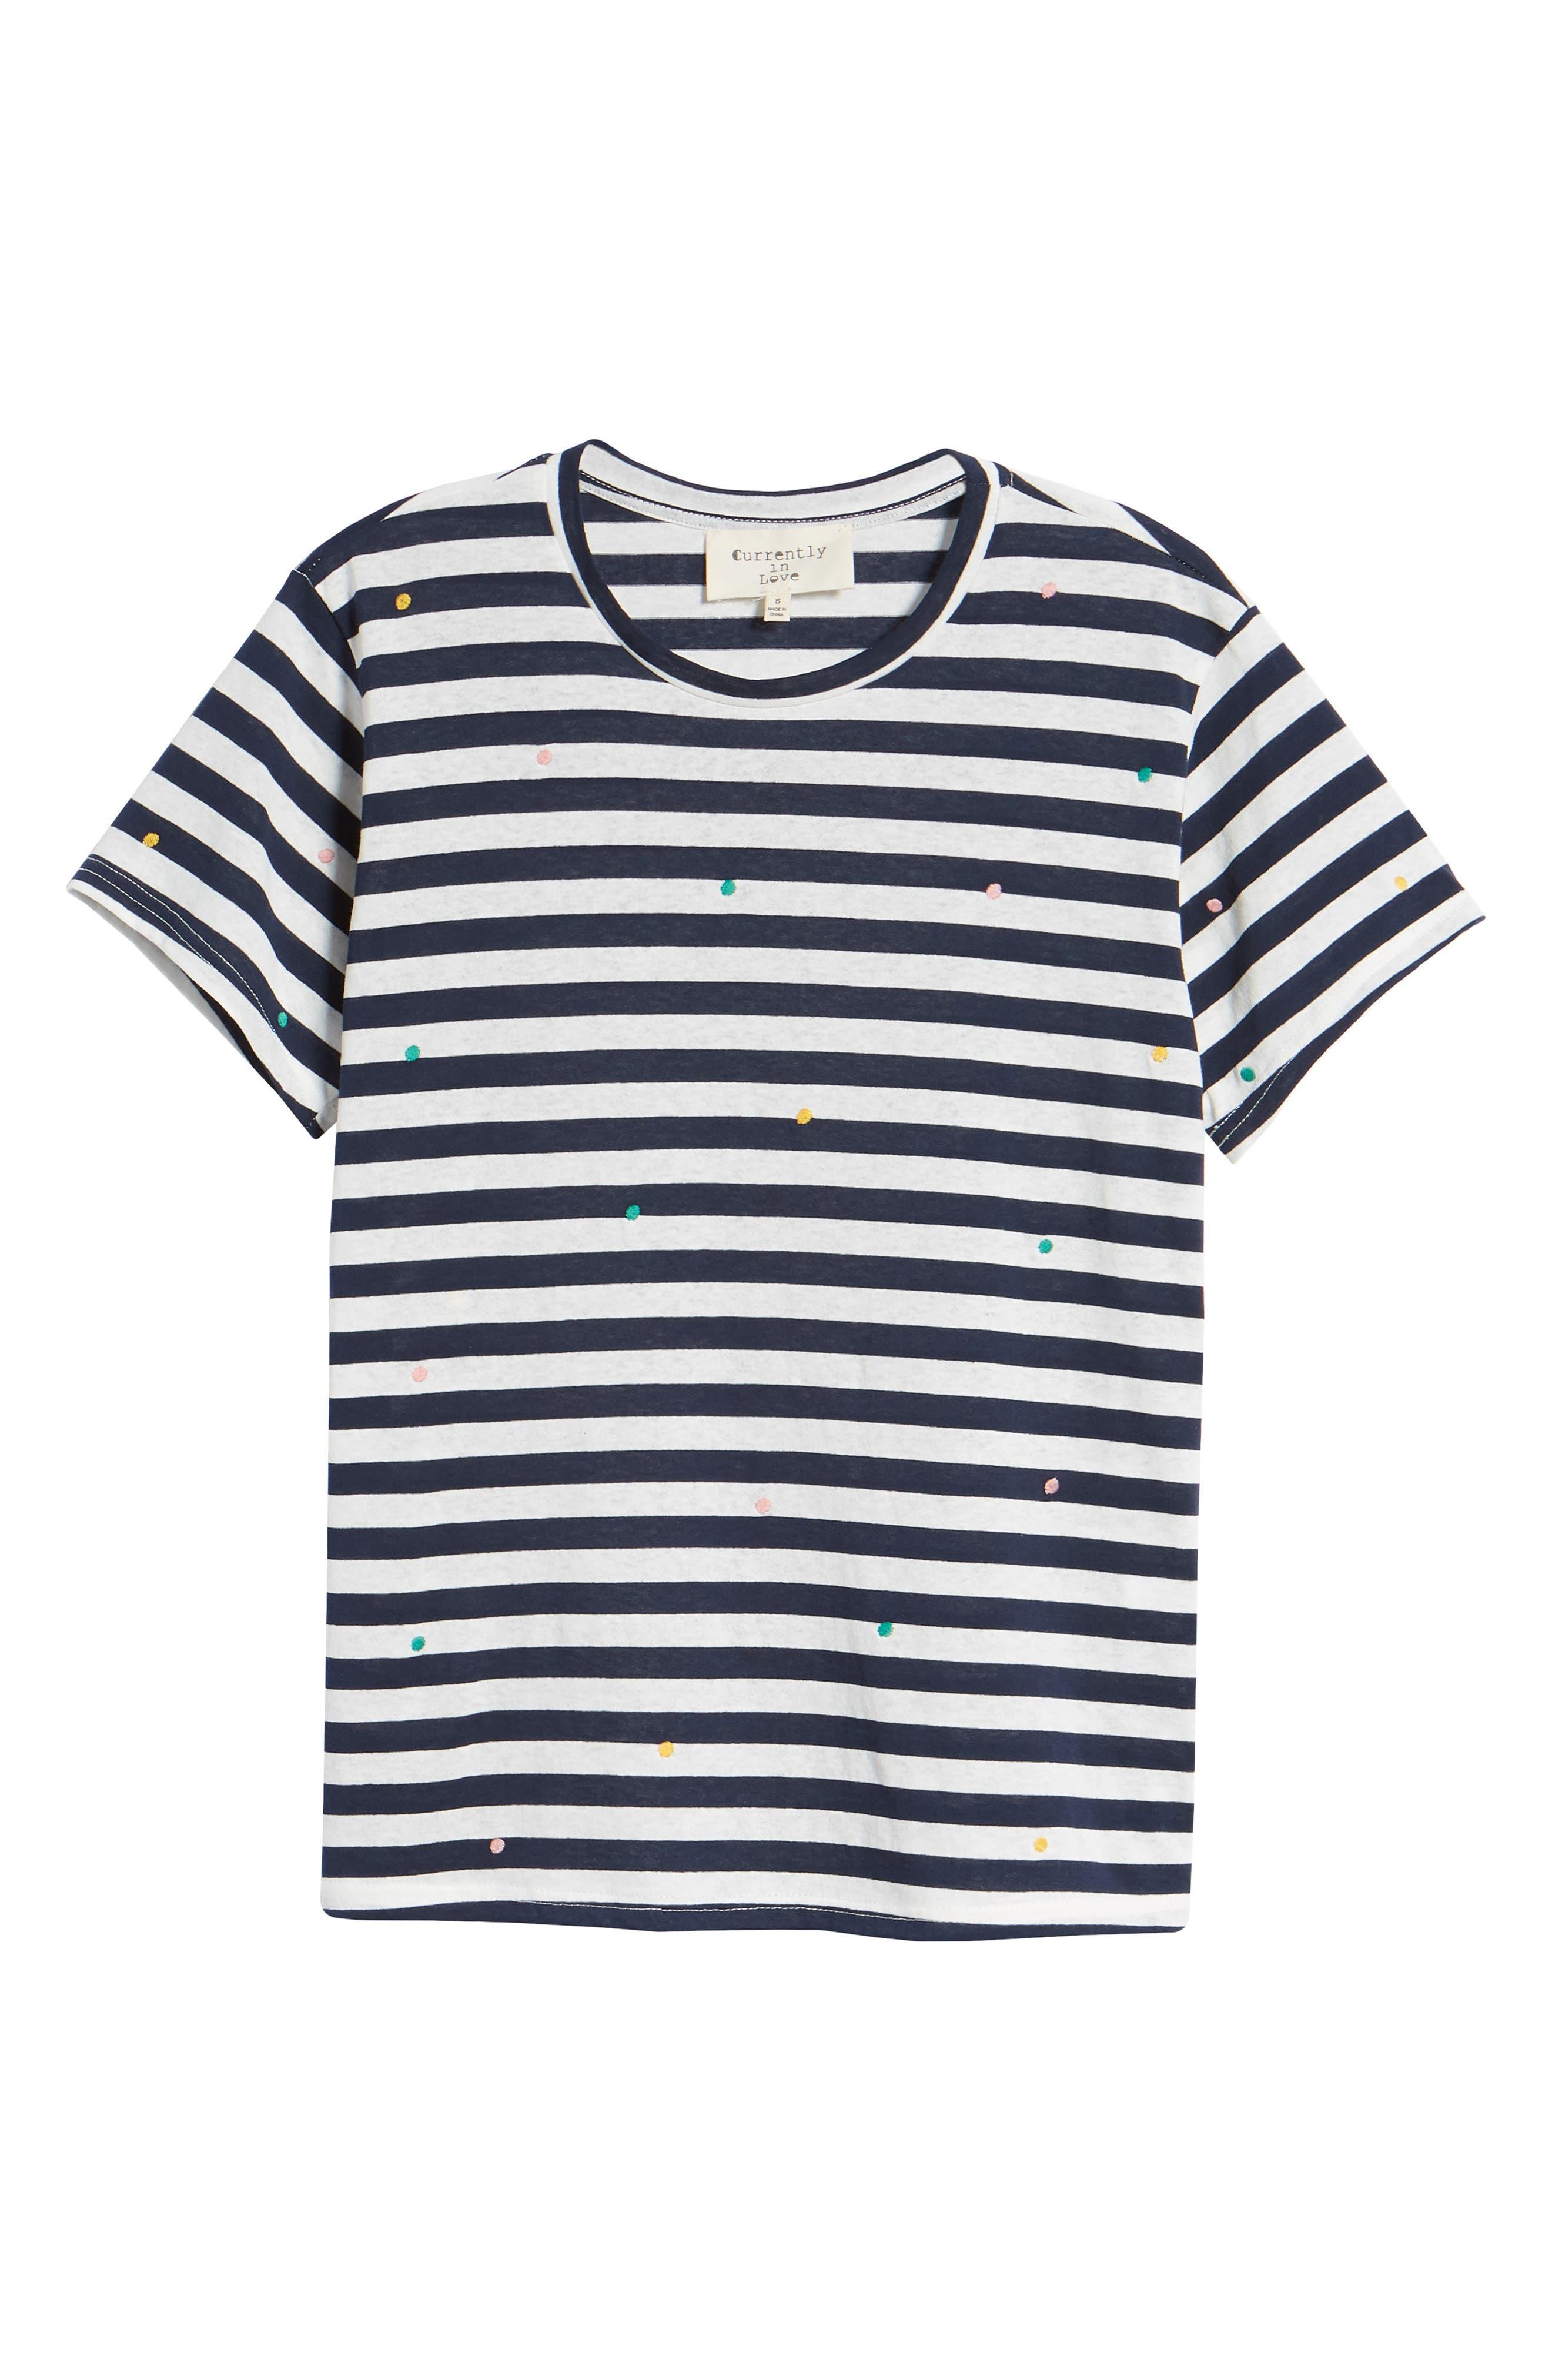 Polka Dot Embroidered Stripe Tee,                             Alternate thumbnail 7, color,                             Navy/ White